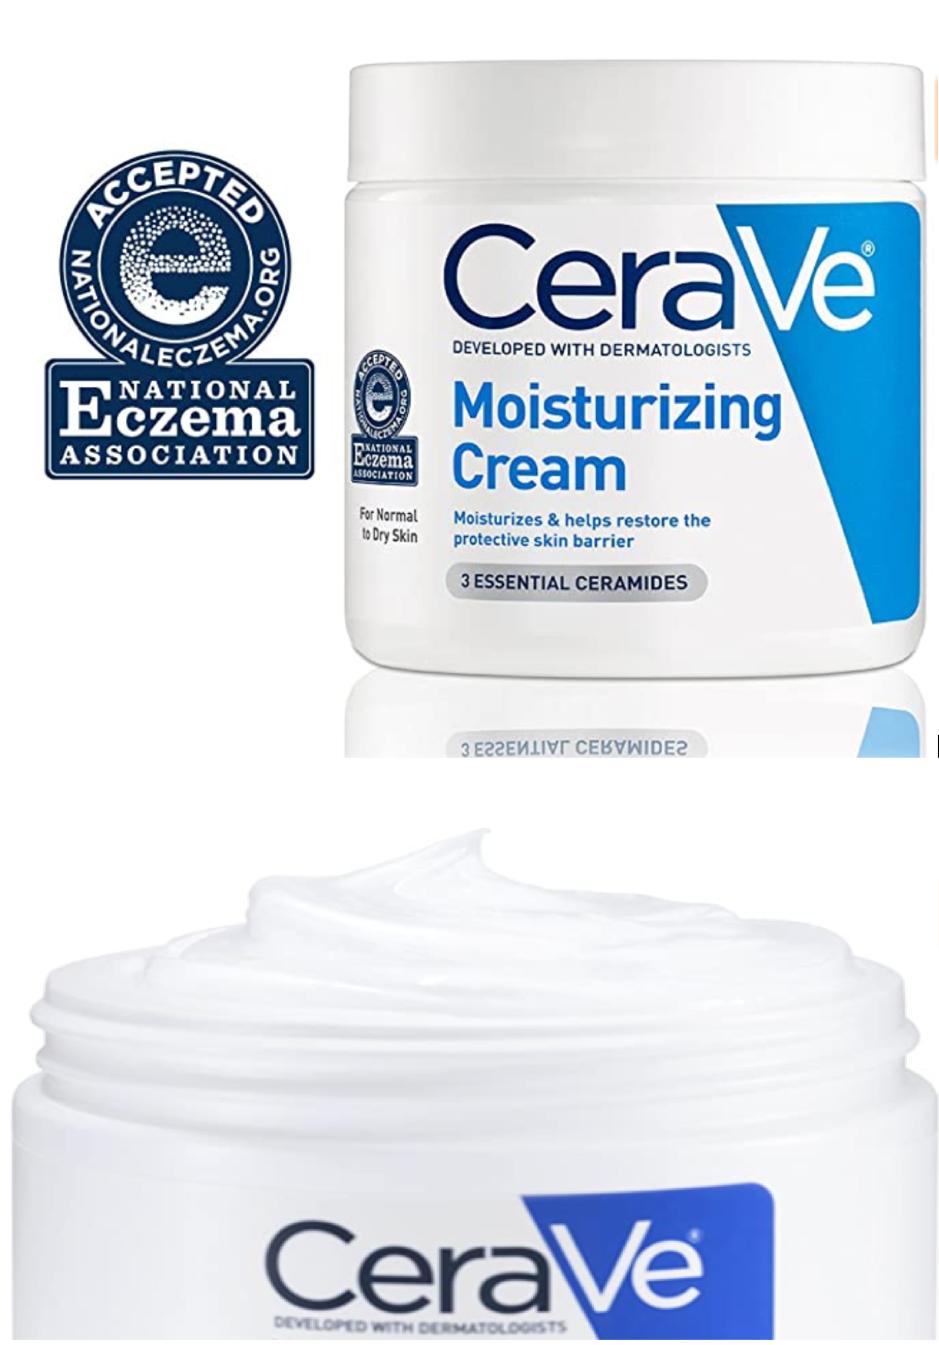 كريم مرطب يومي للجسم والوجه من سيرا في 16 اونصة Skin Moisturizer Skin Help Beauty And Personal Care